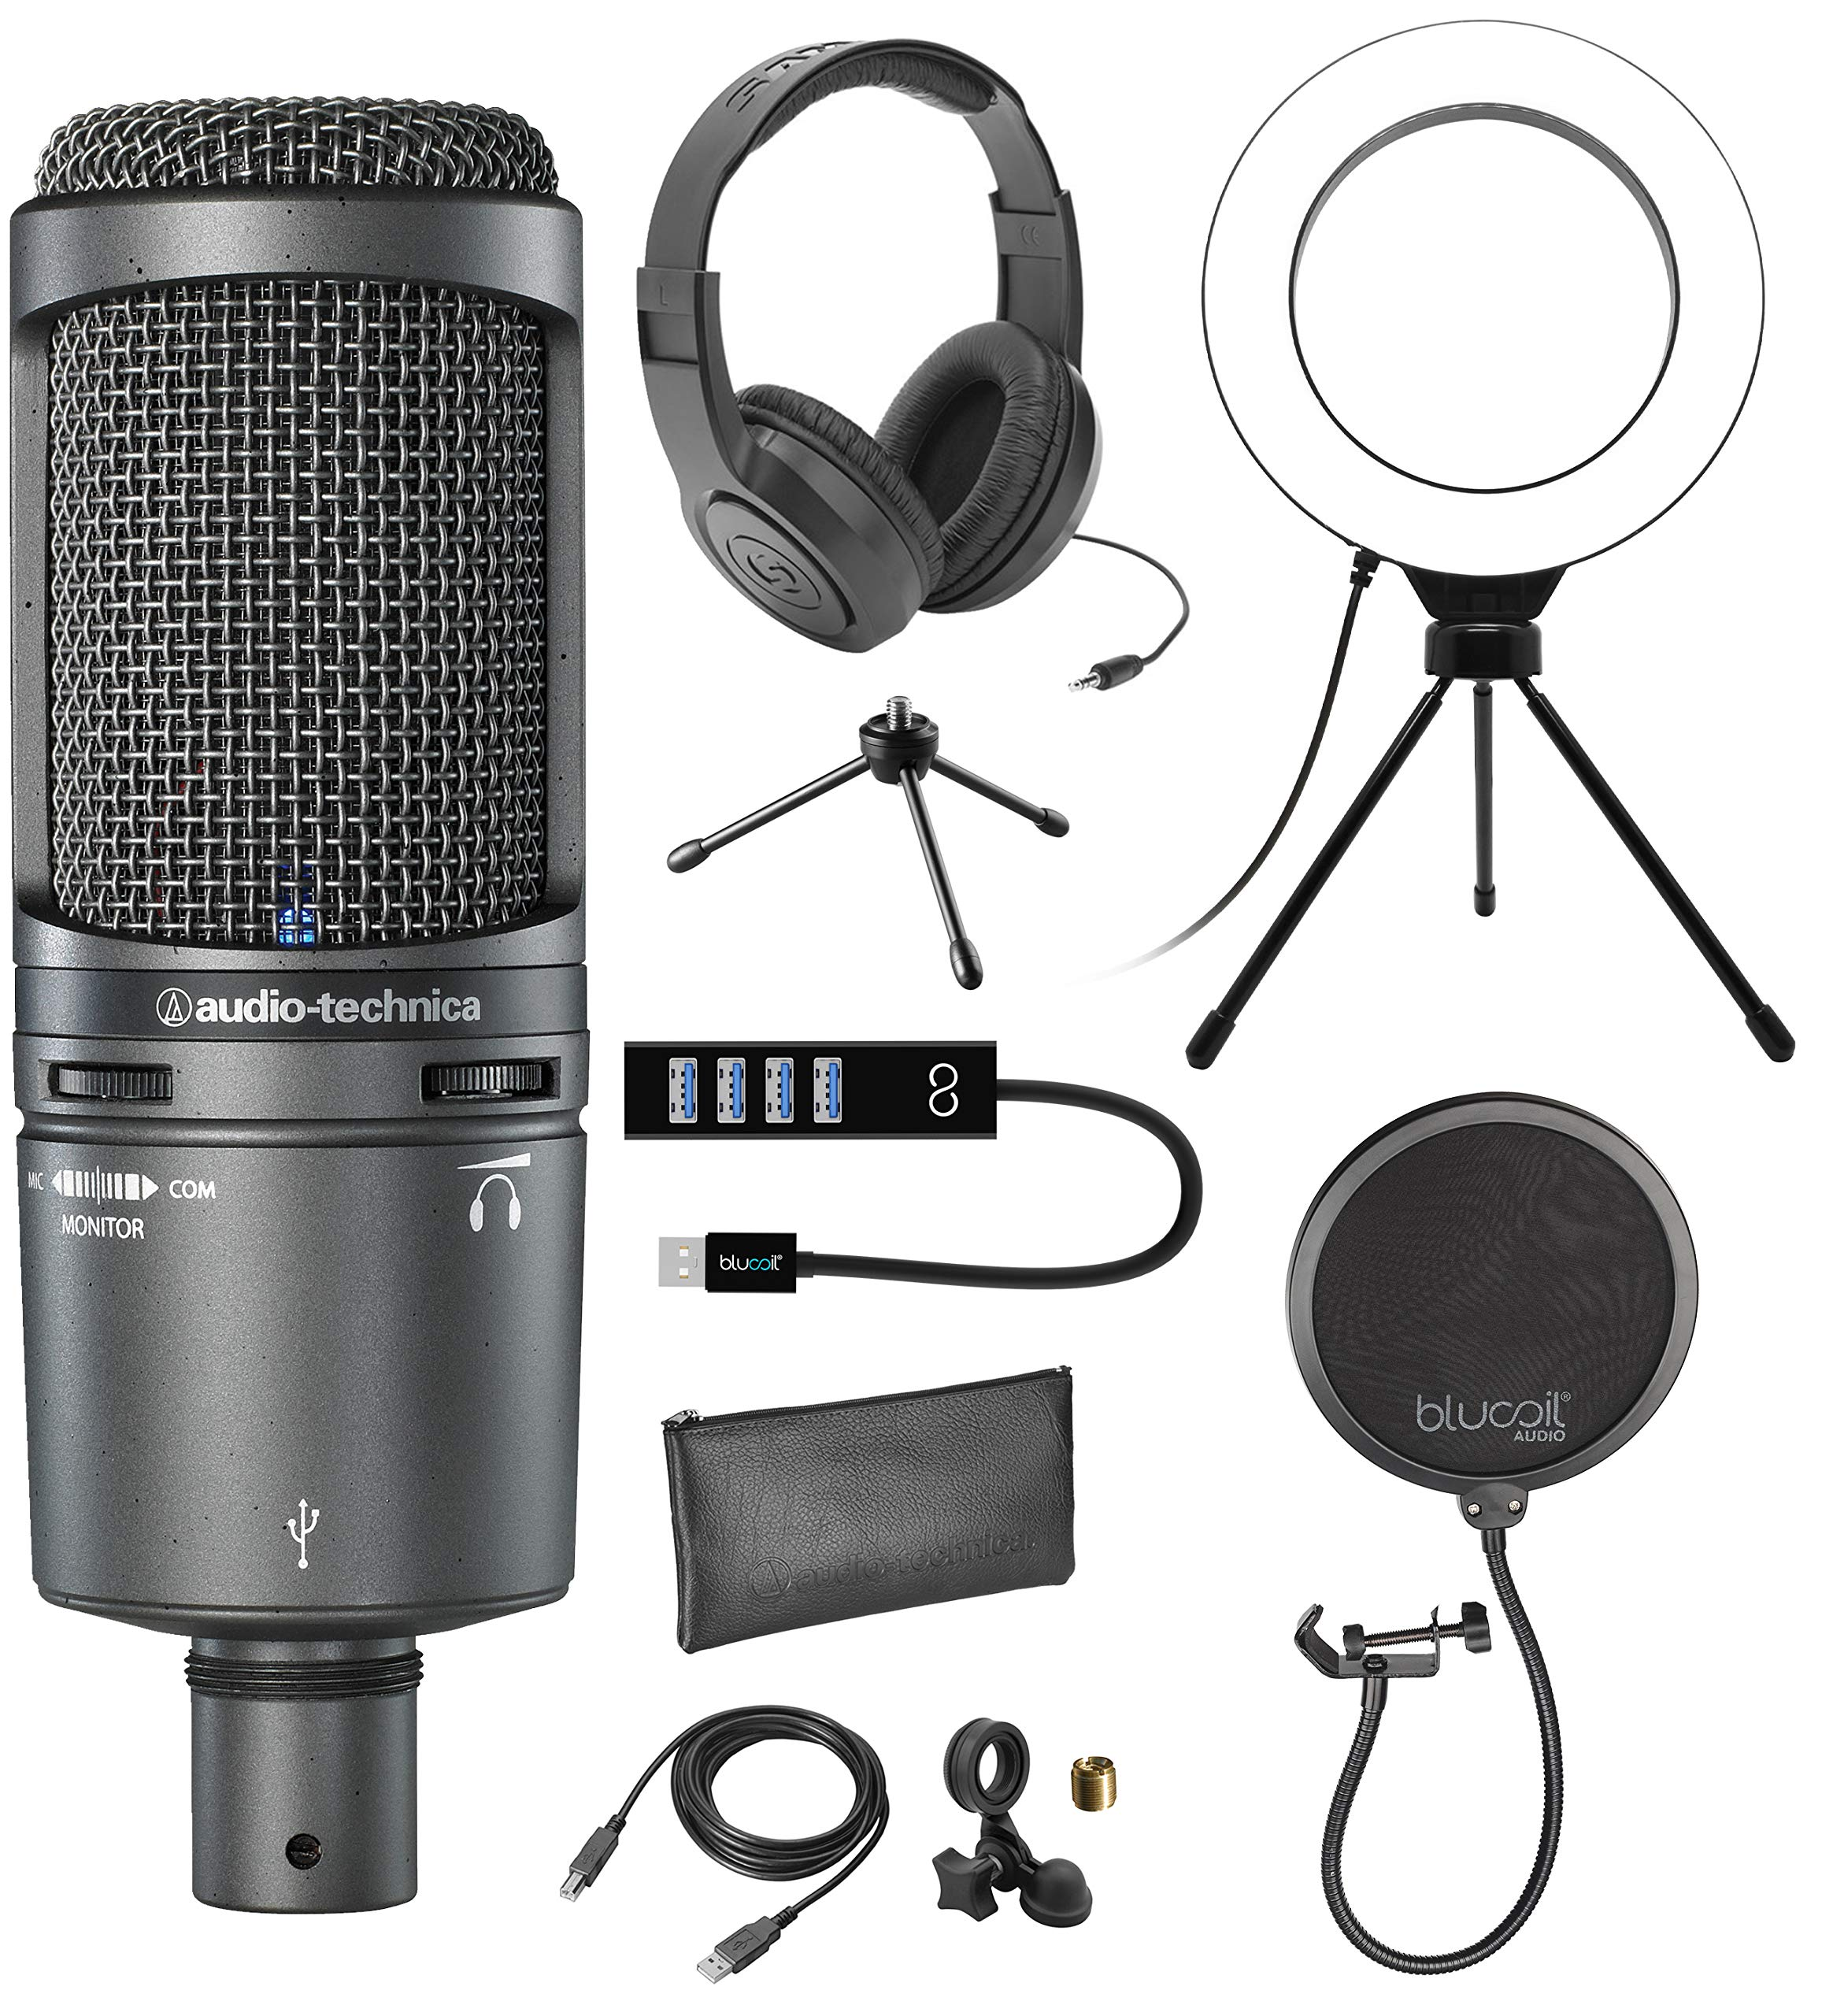 Microfono Audio-Technica AT2020USB+ Cardioid Condenser with